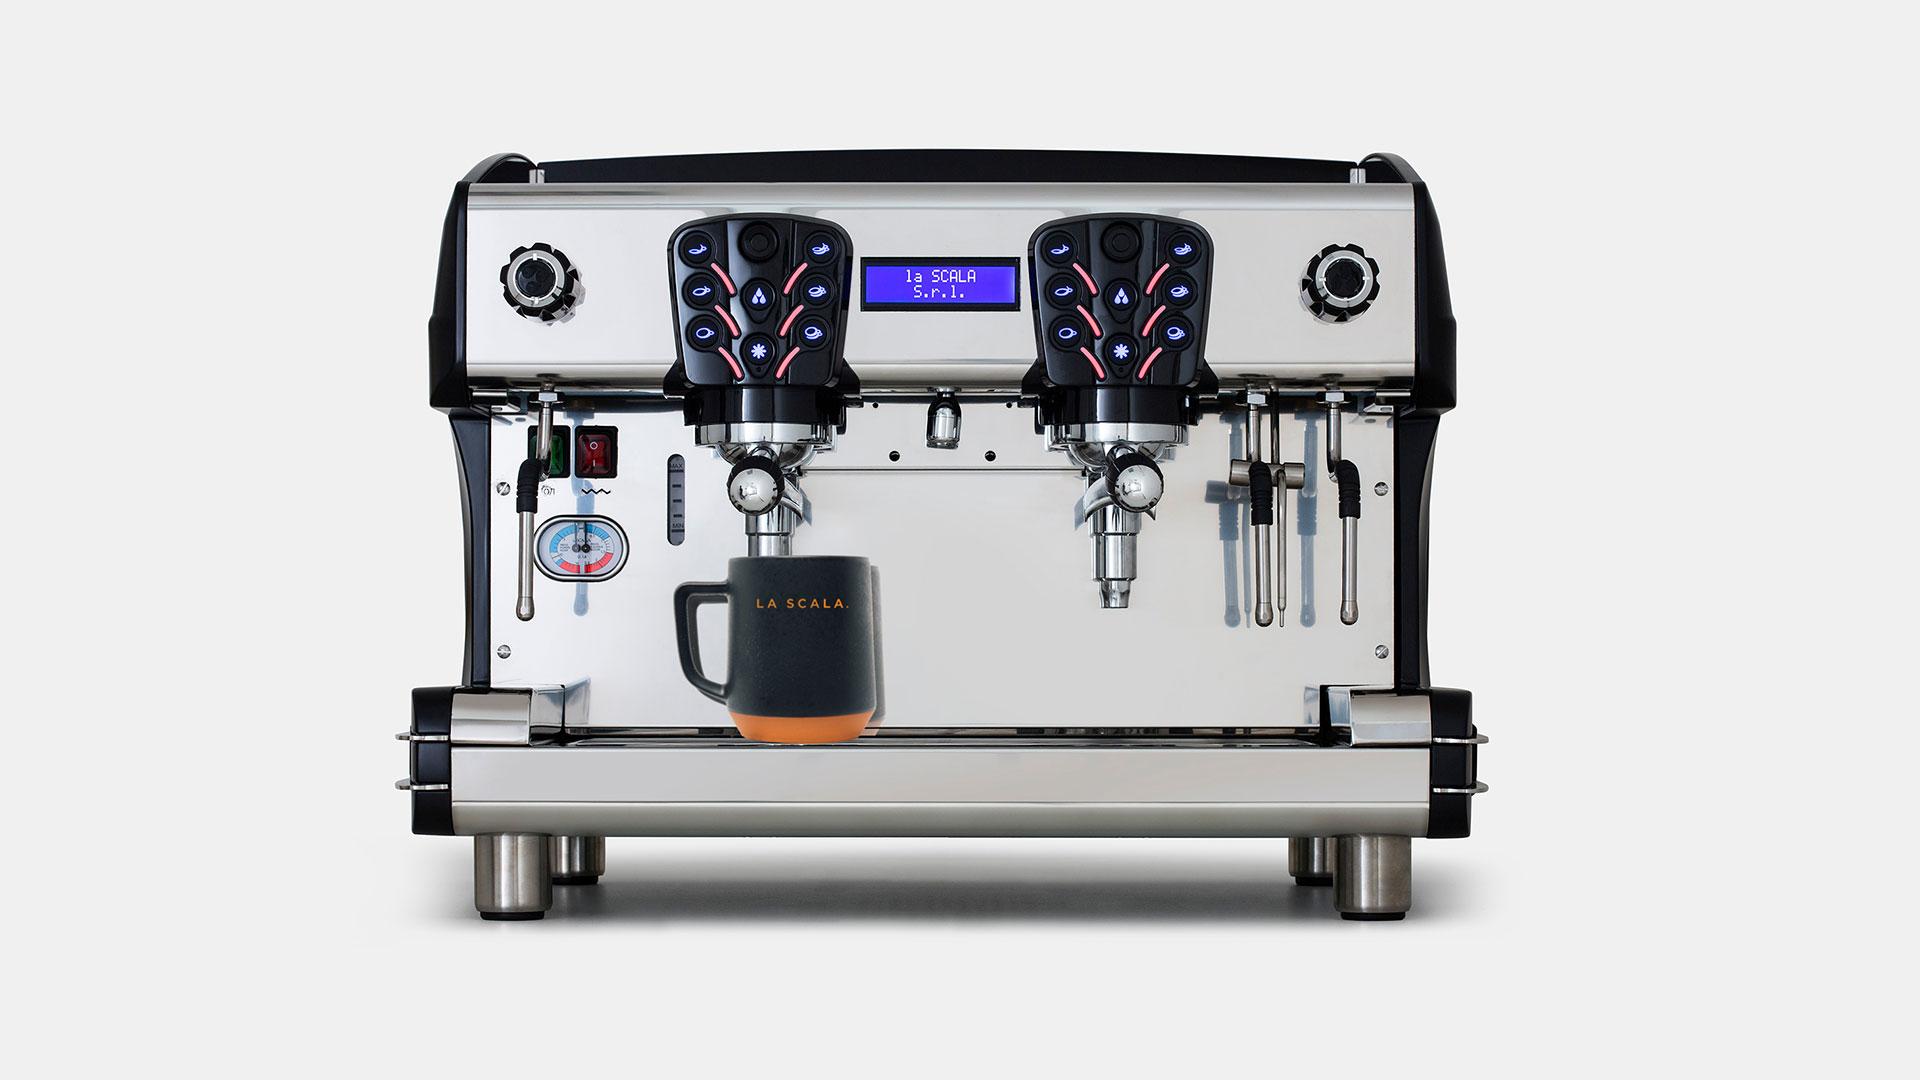 la-scala-macchine-caffe-espresso-made-in-italy-mug